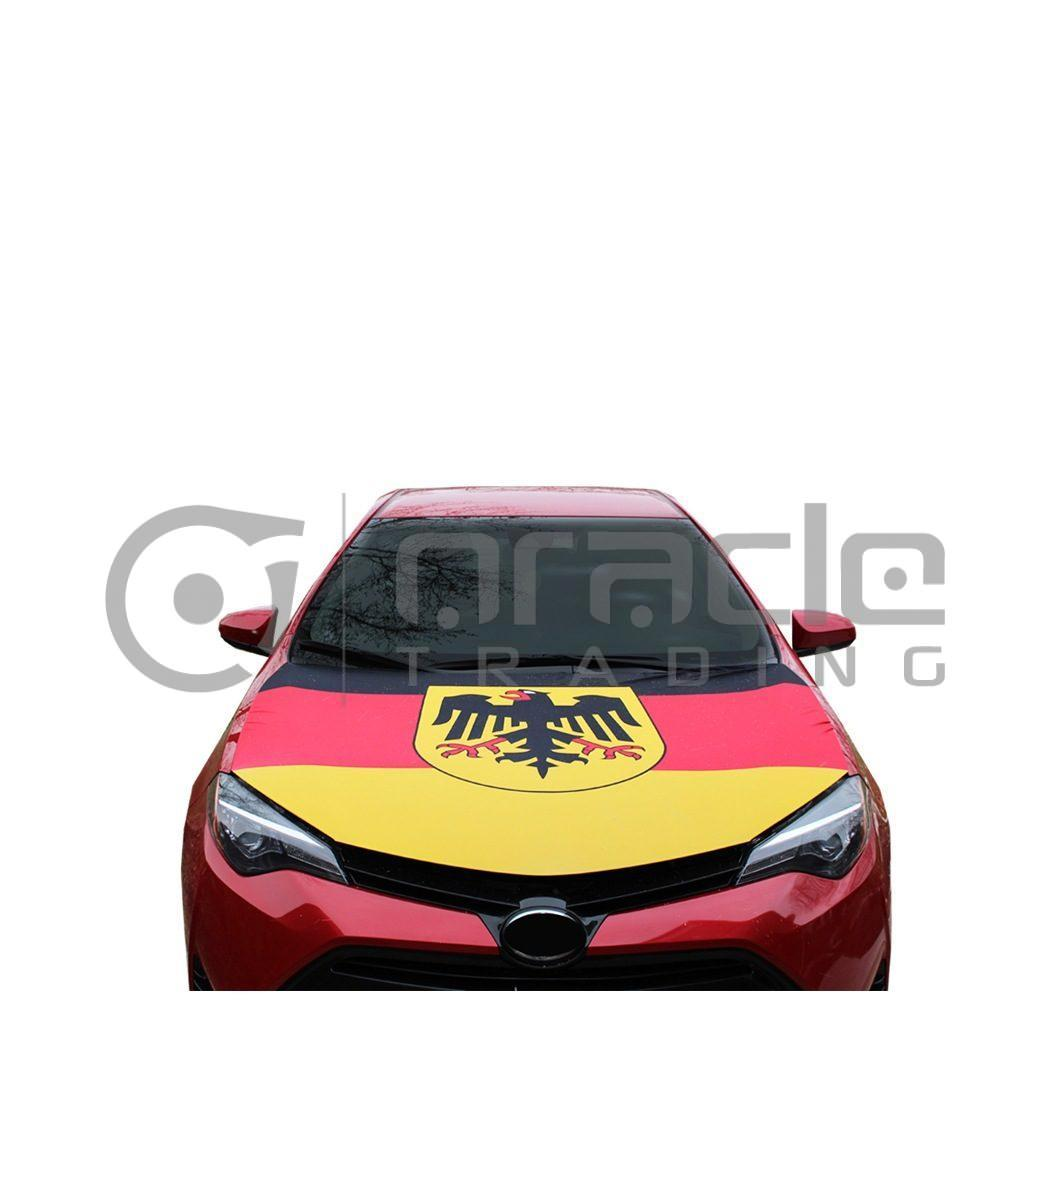 Germany Hood Cover - Eagle